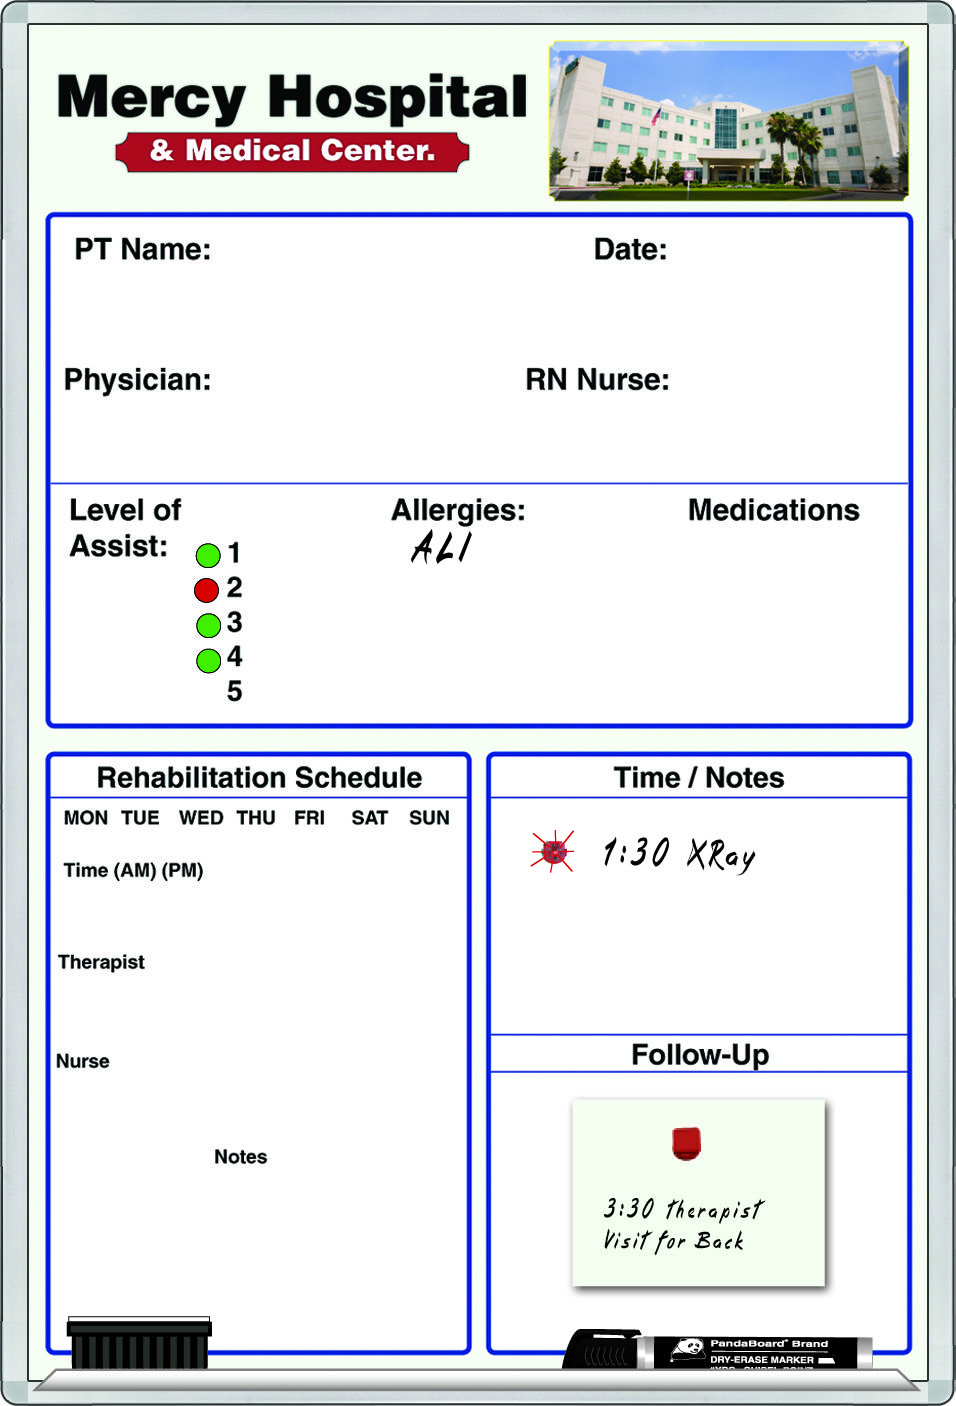 Hospital PatientBedside™ CustomPrinted Dry